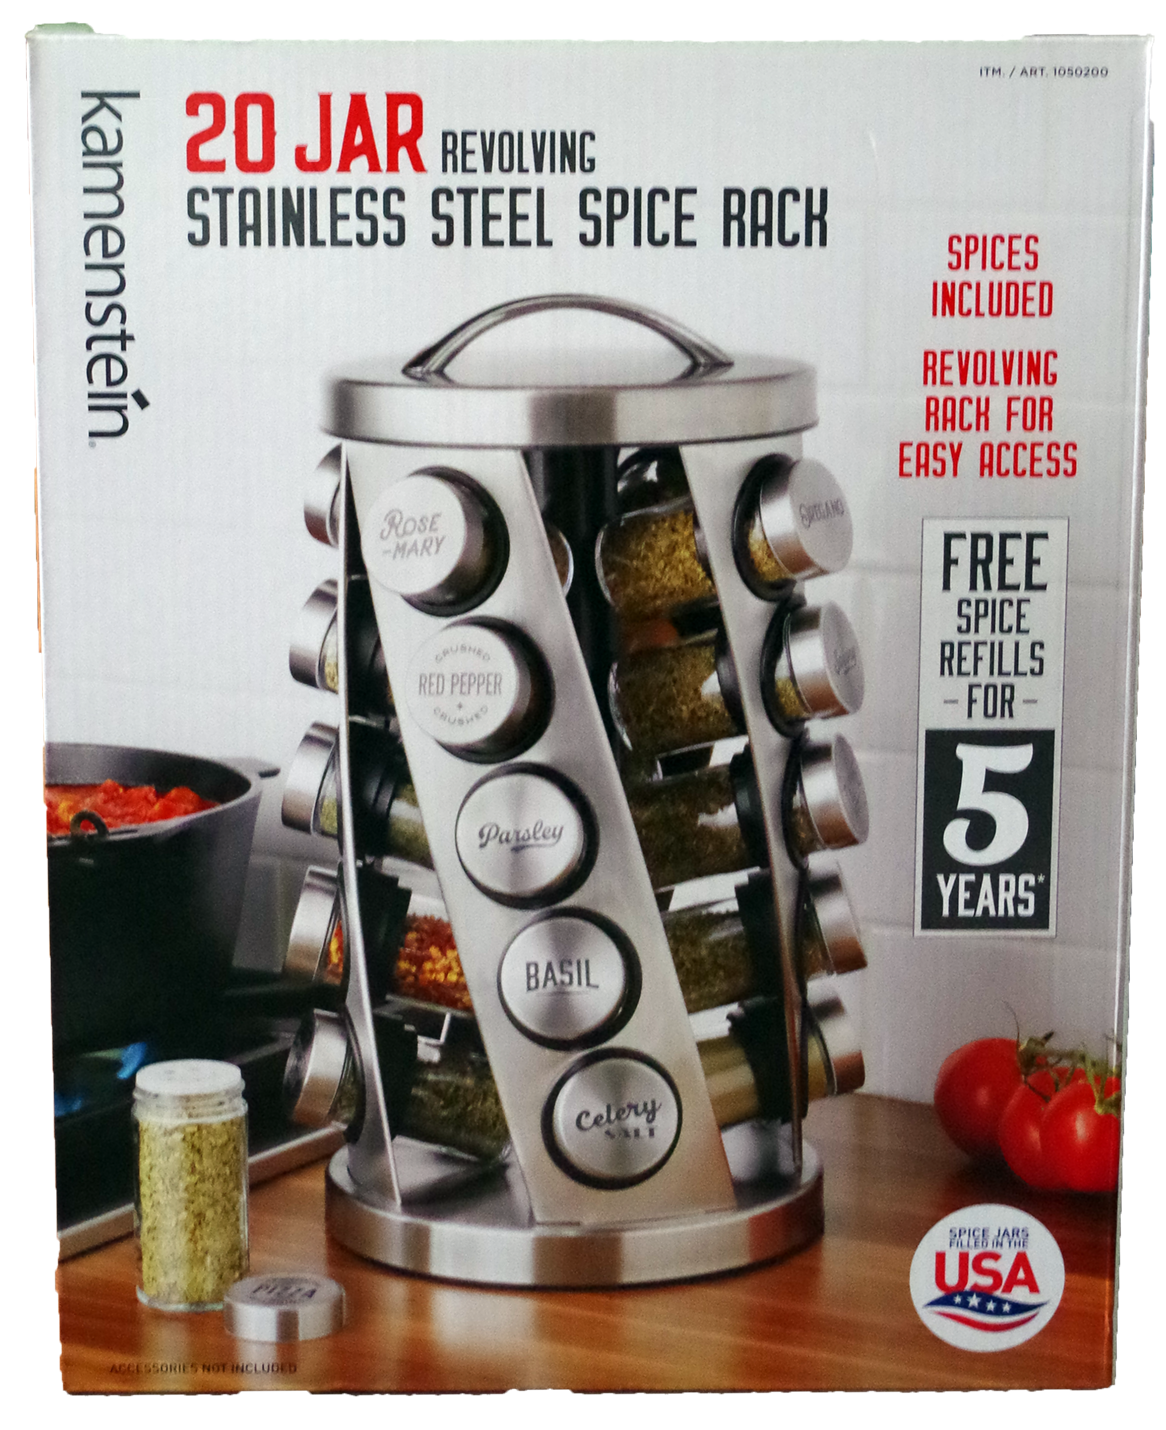 Kamenstein 20 jar revolving stainless steel spice rack